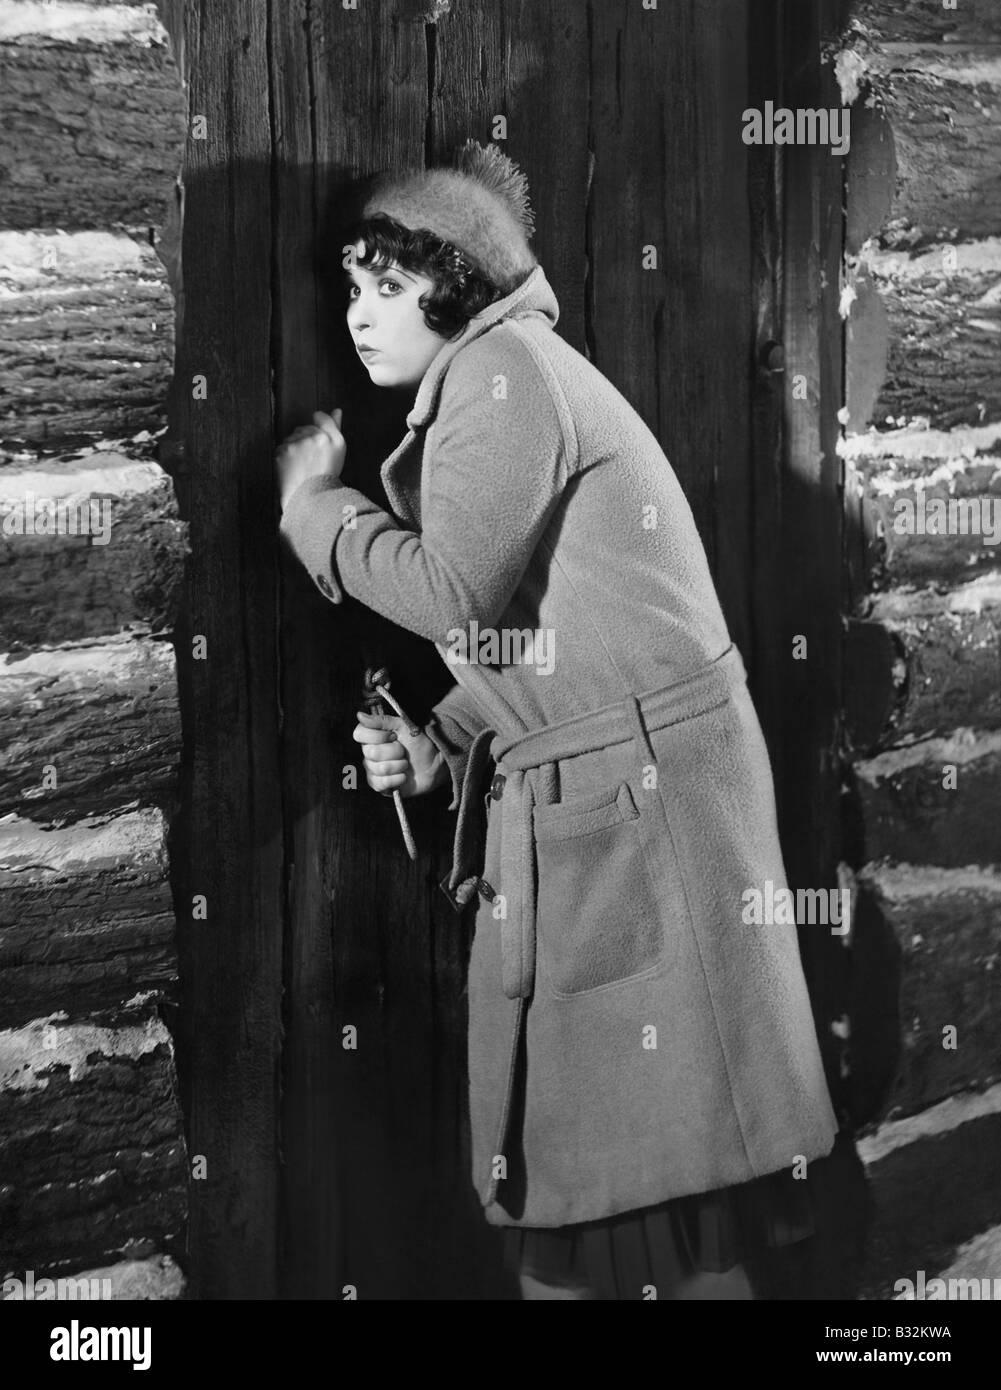 Woman knocking on cabin door - Stock Image